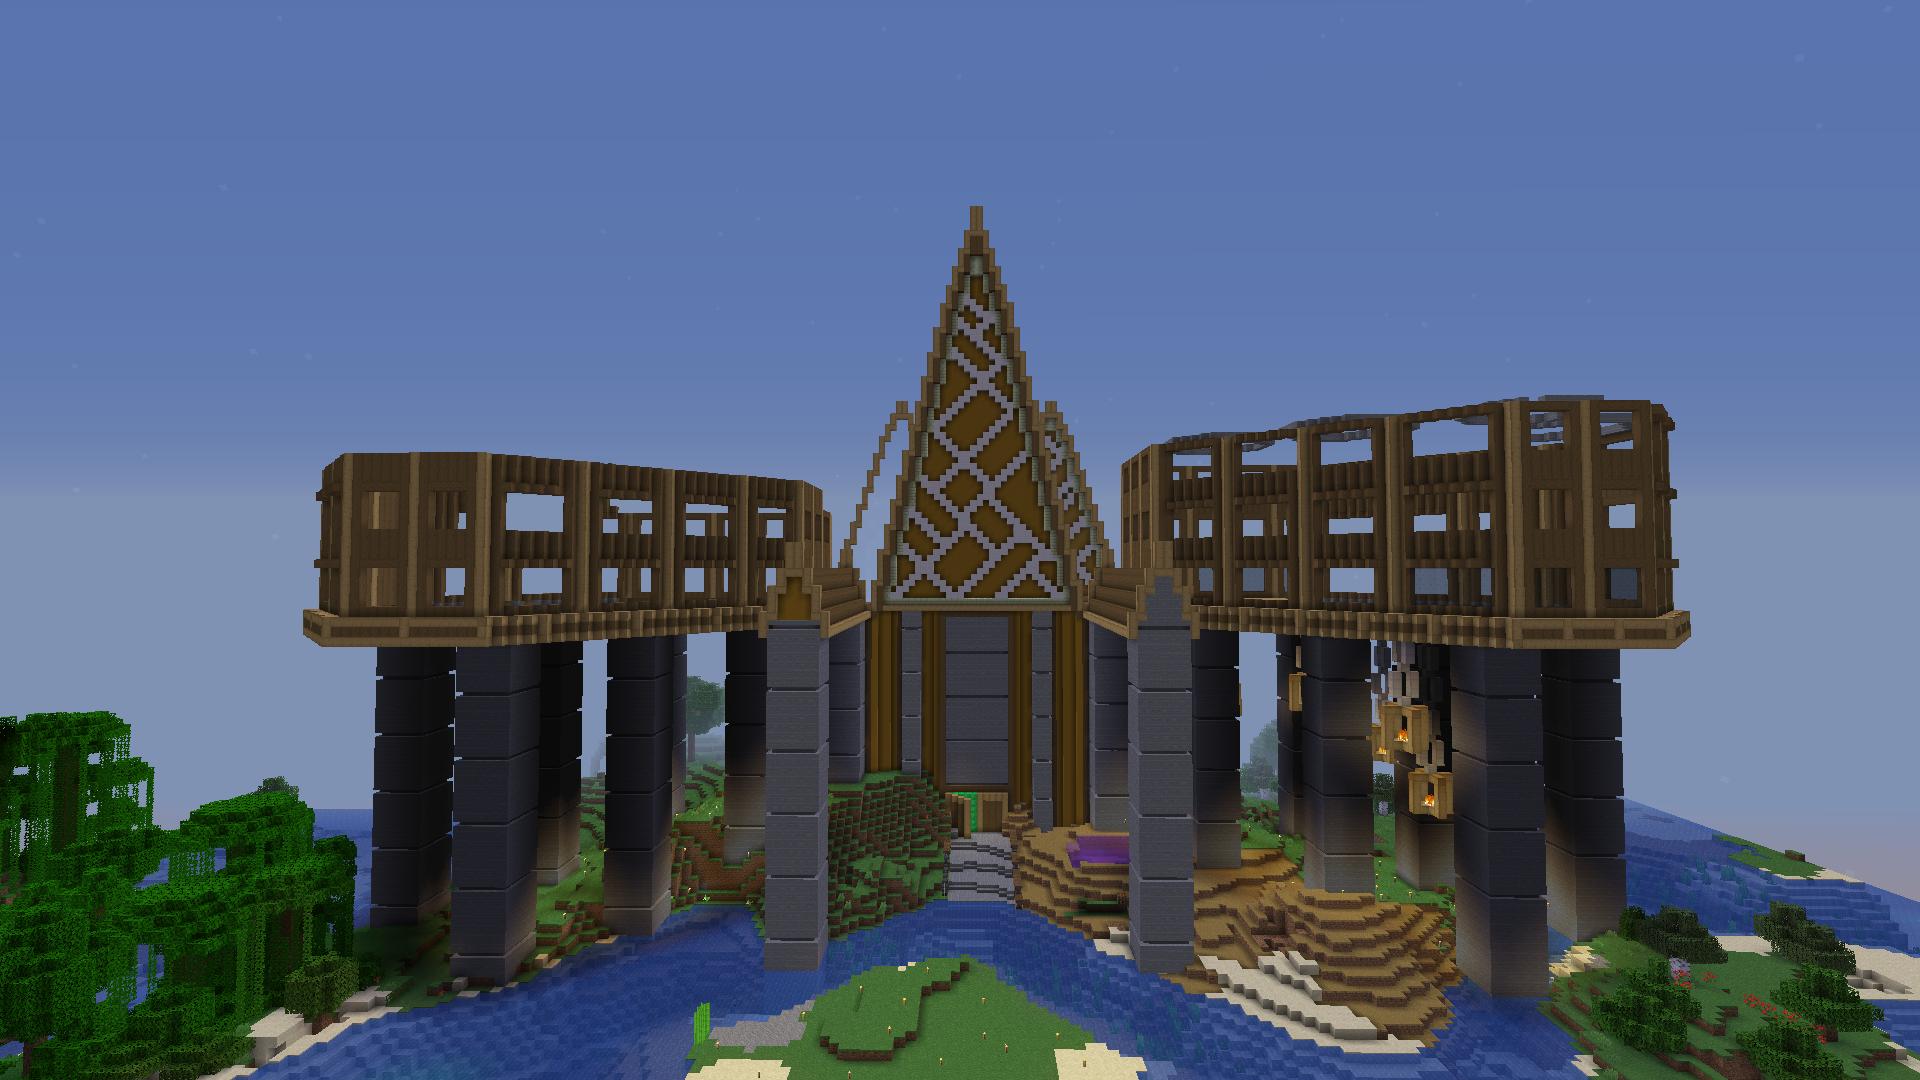 My Minecraft Survival Mega Base So Far What Do You Think By U Oppositegame Minecraft Survival Minecraft Survival